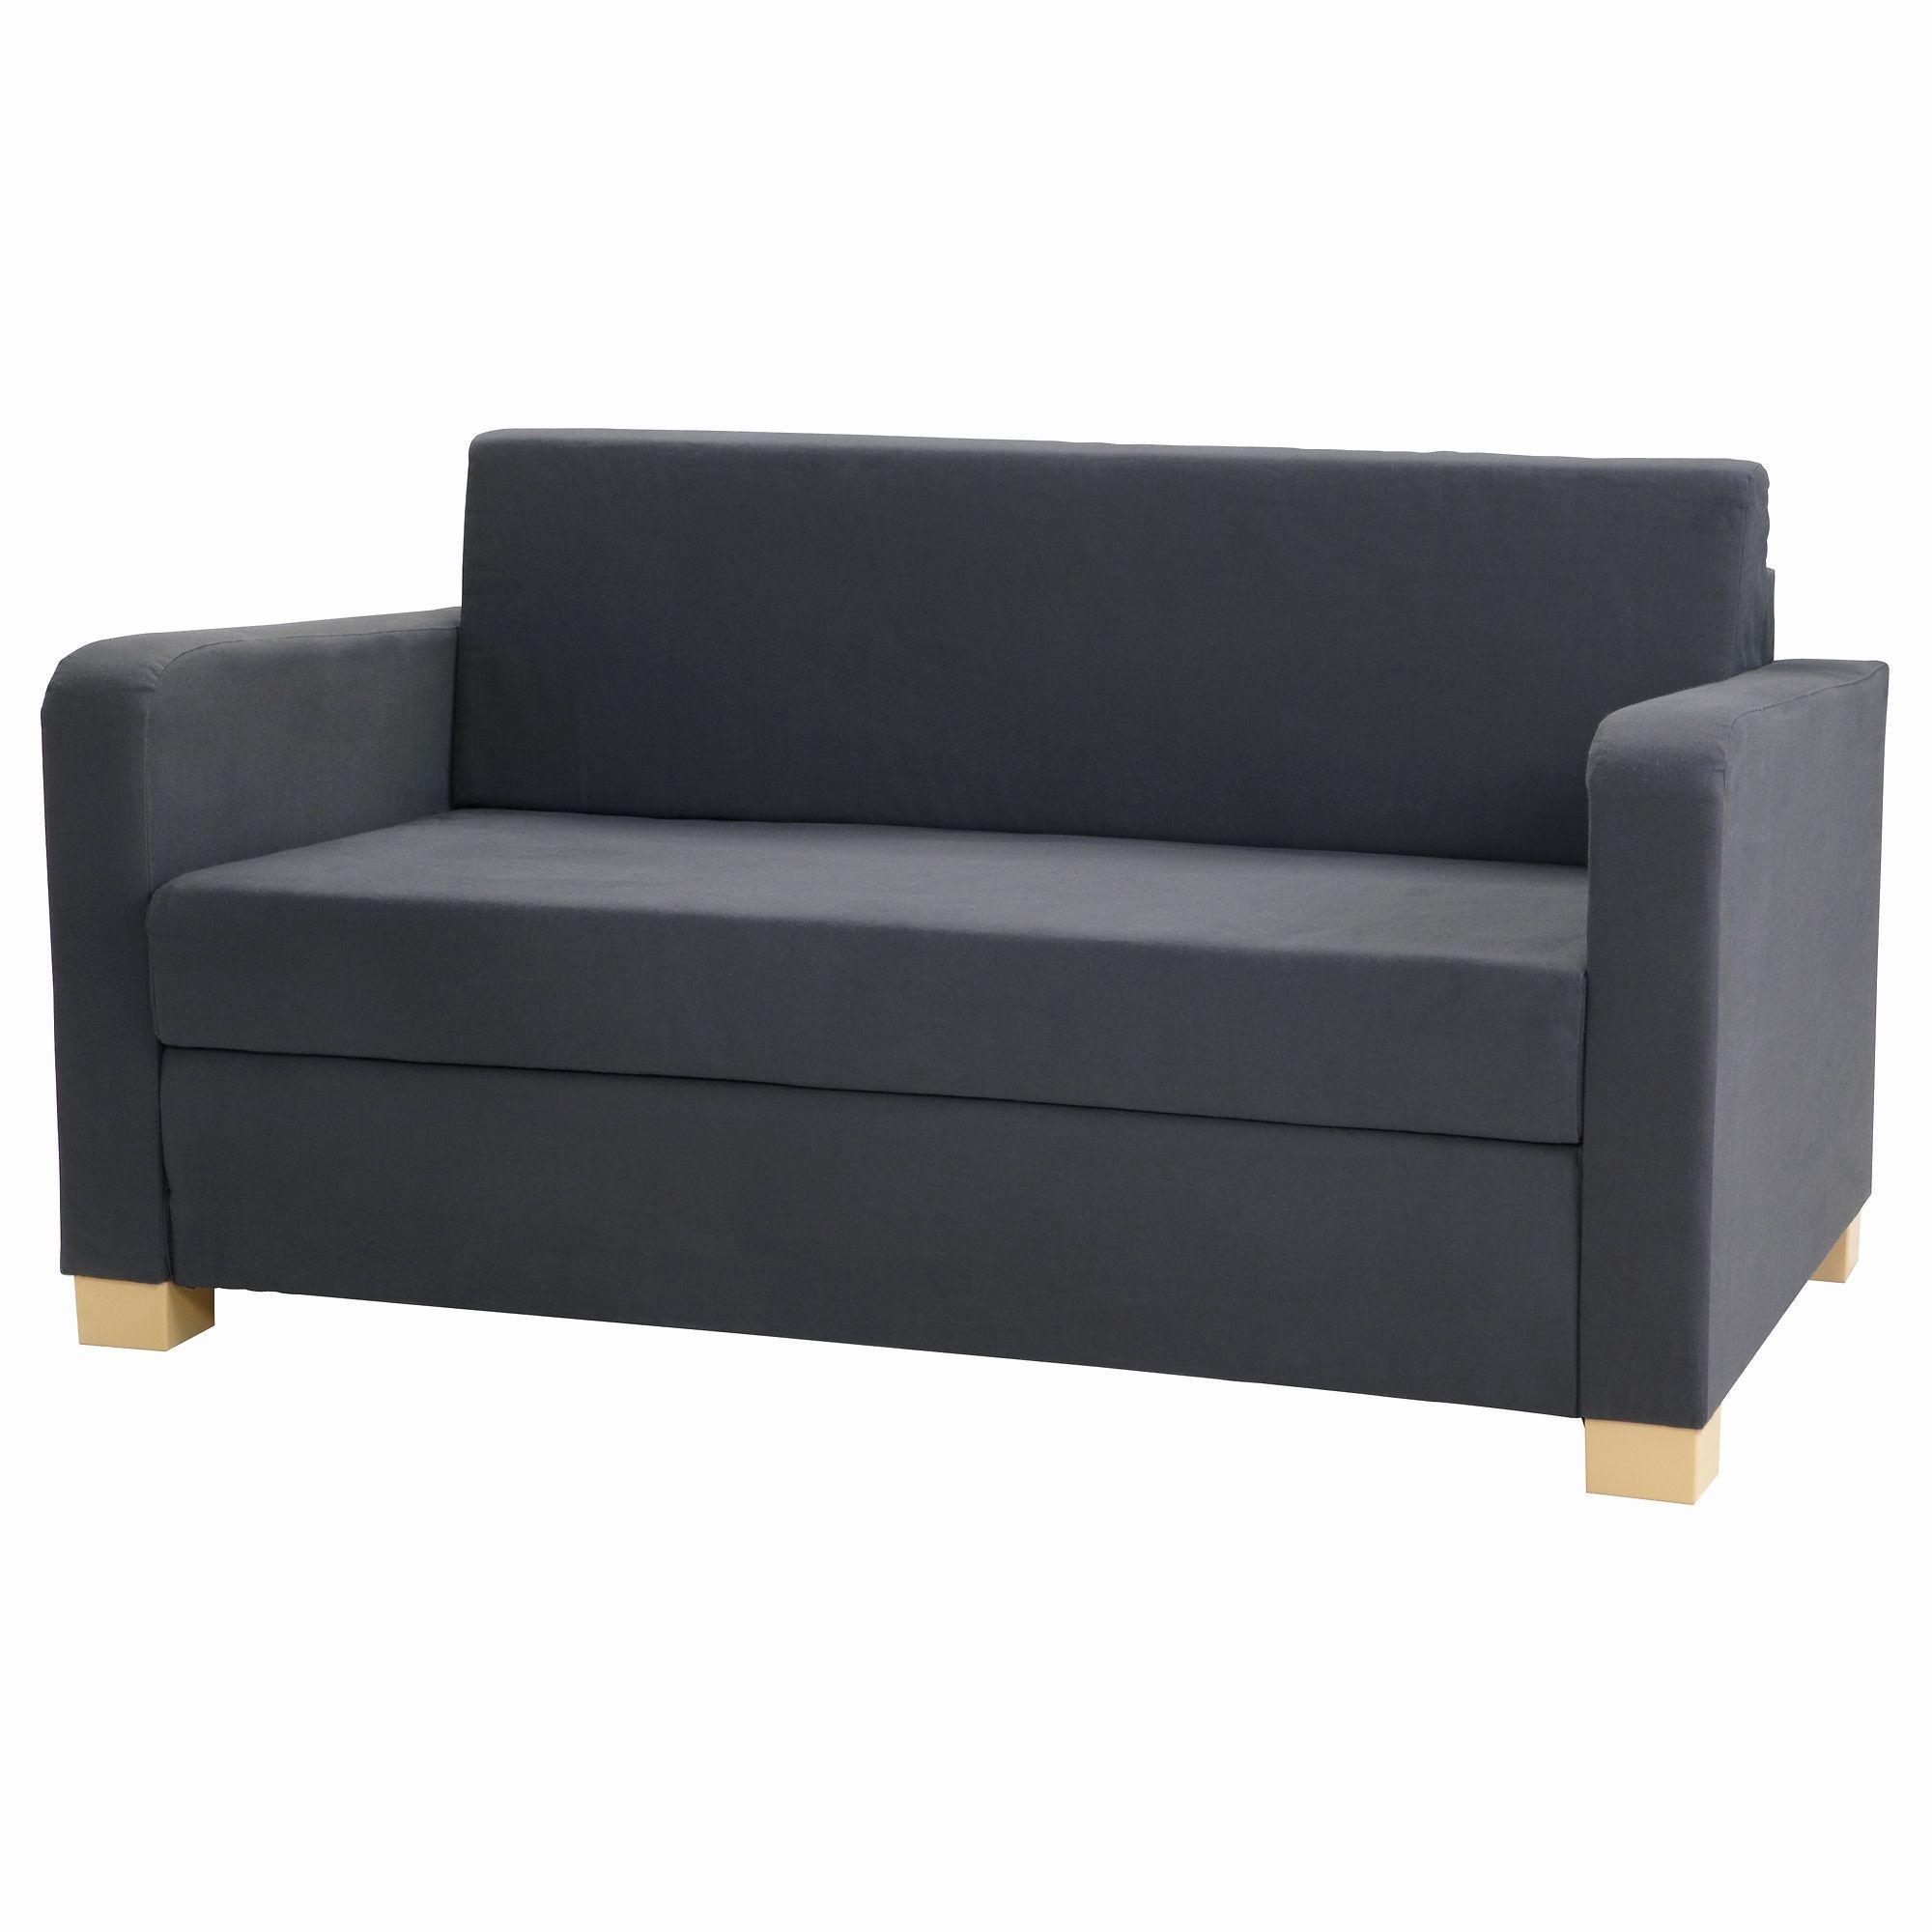 Elegant Sleeper Sofa Chair Pics Sleeper Sofas Chair Beds Ikea